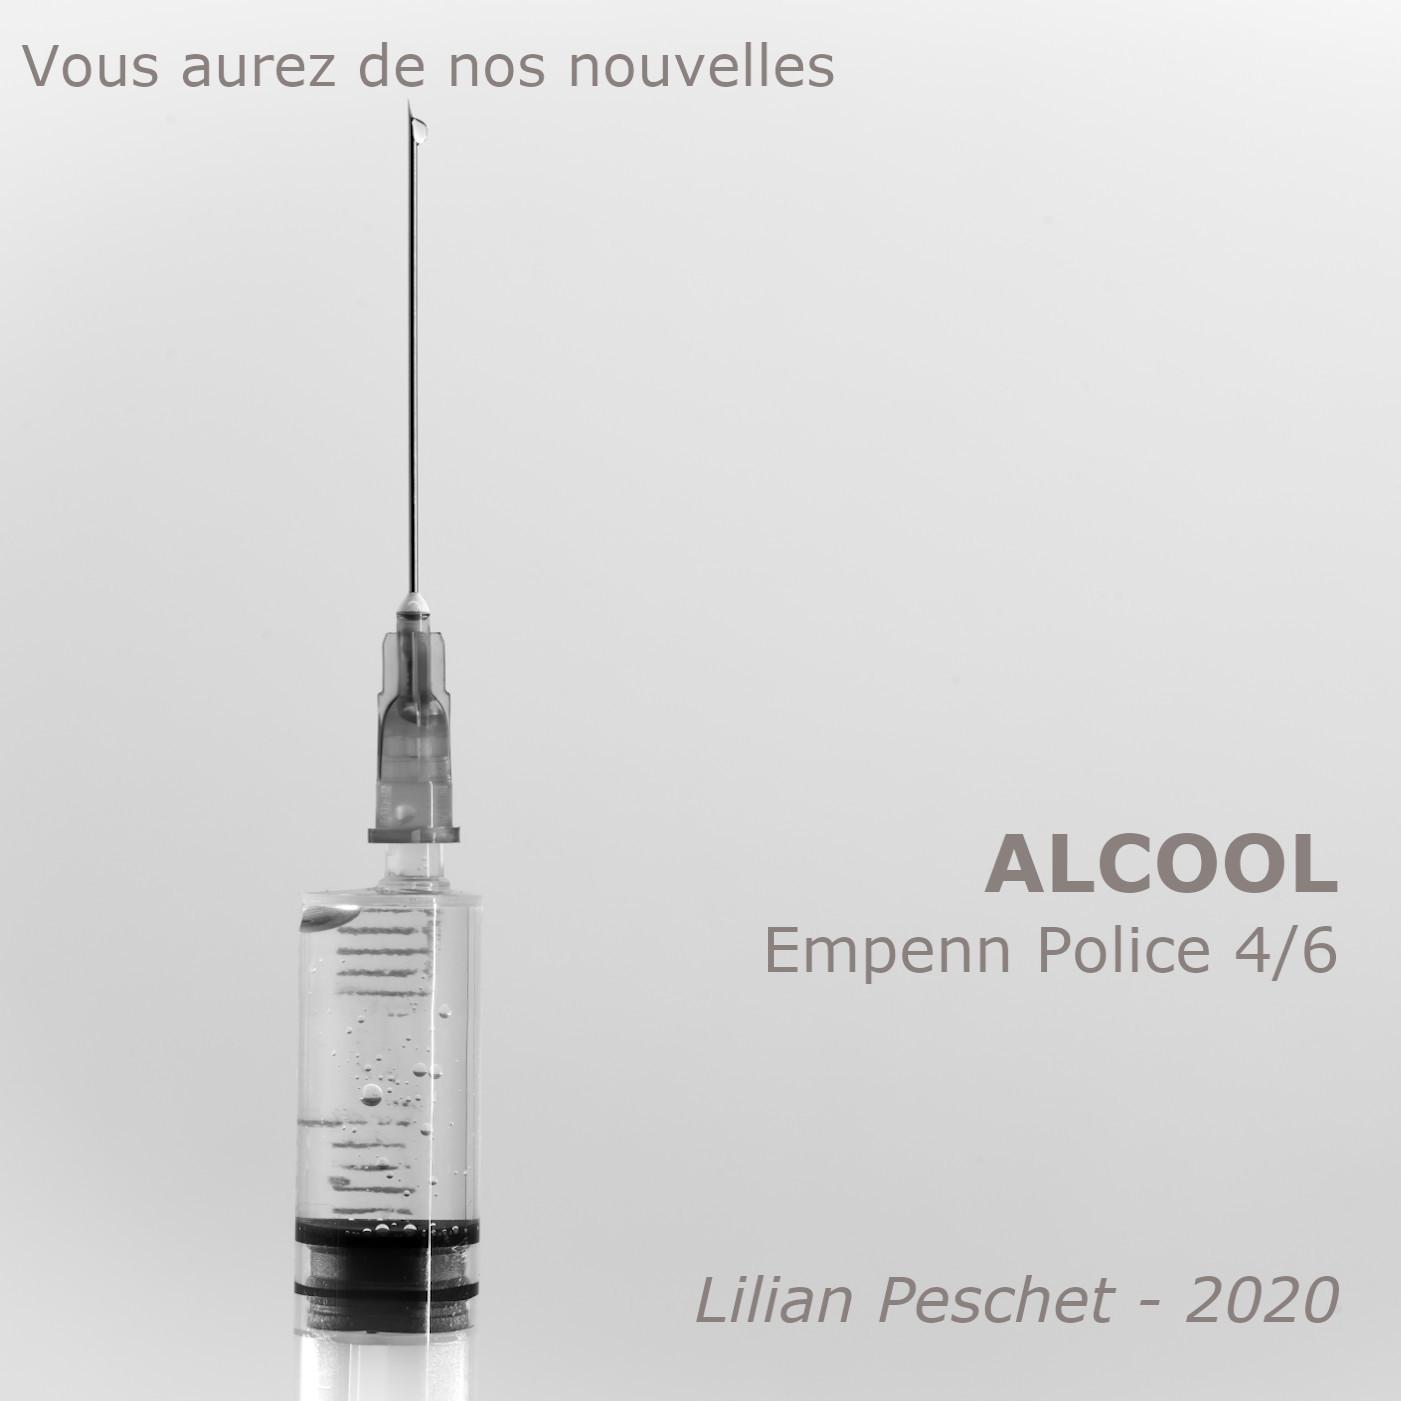 Alcool - Empenn Police 4/6